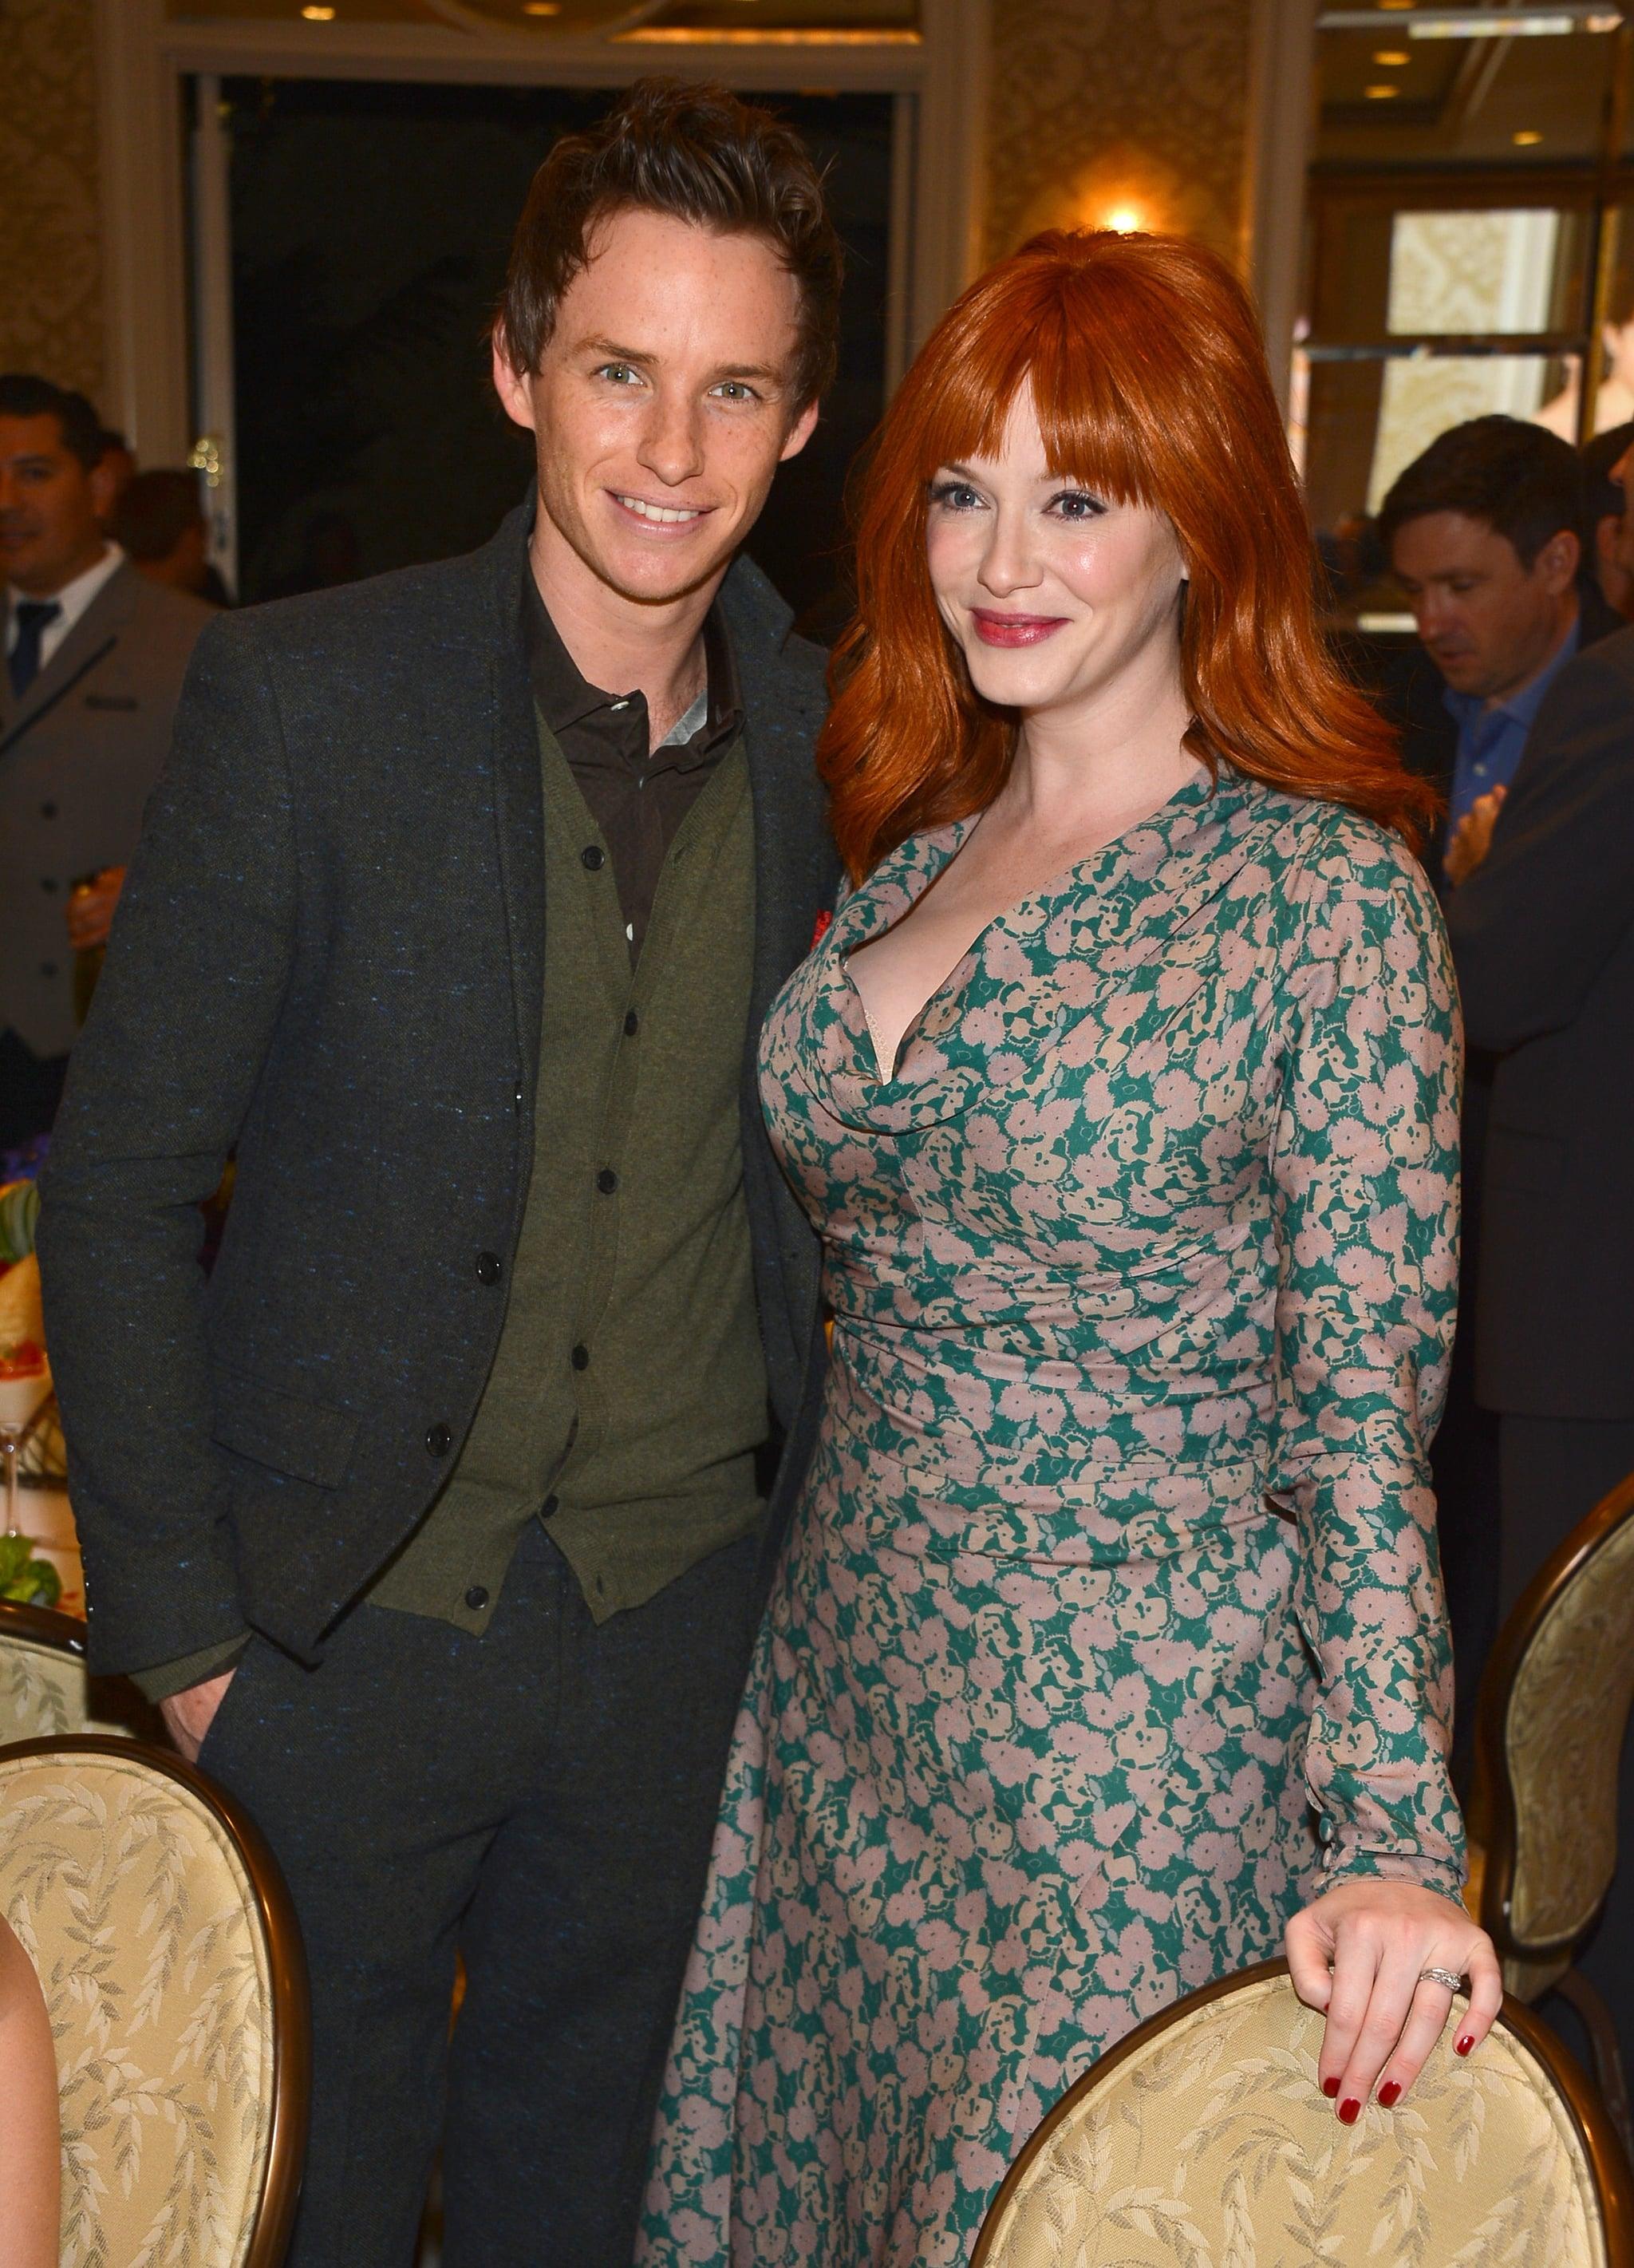 Christina Hendricks took a photo with Eddie Redmayne at the AFI Awards.